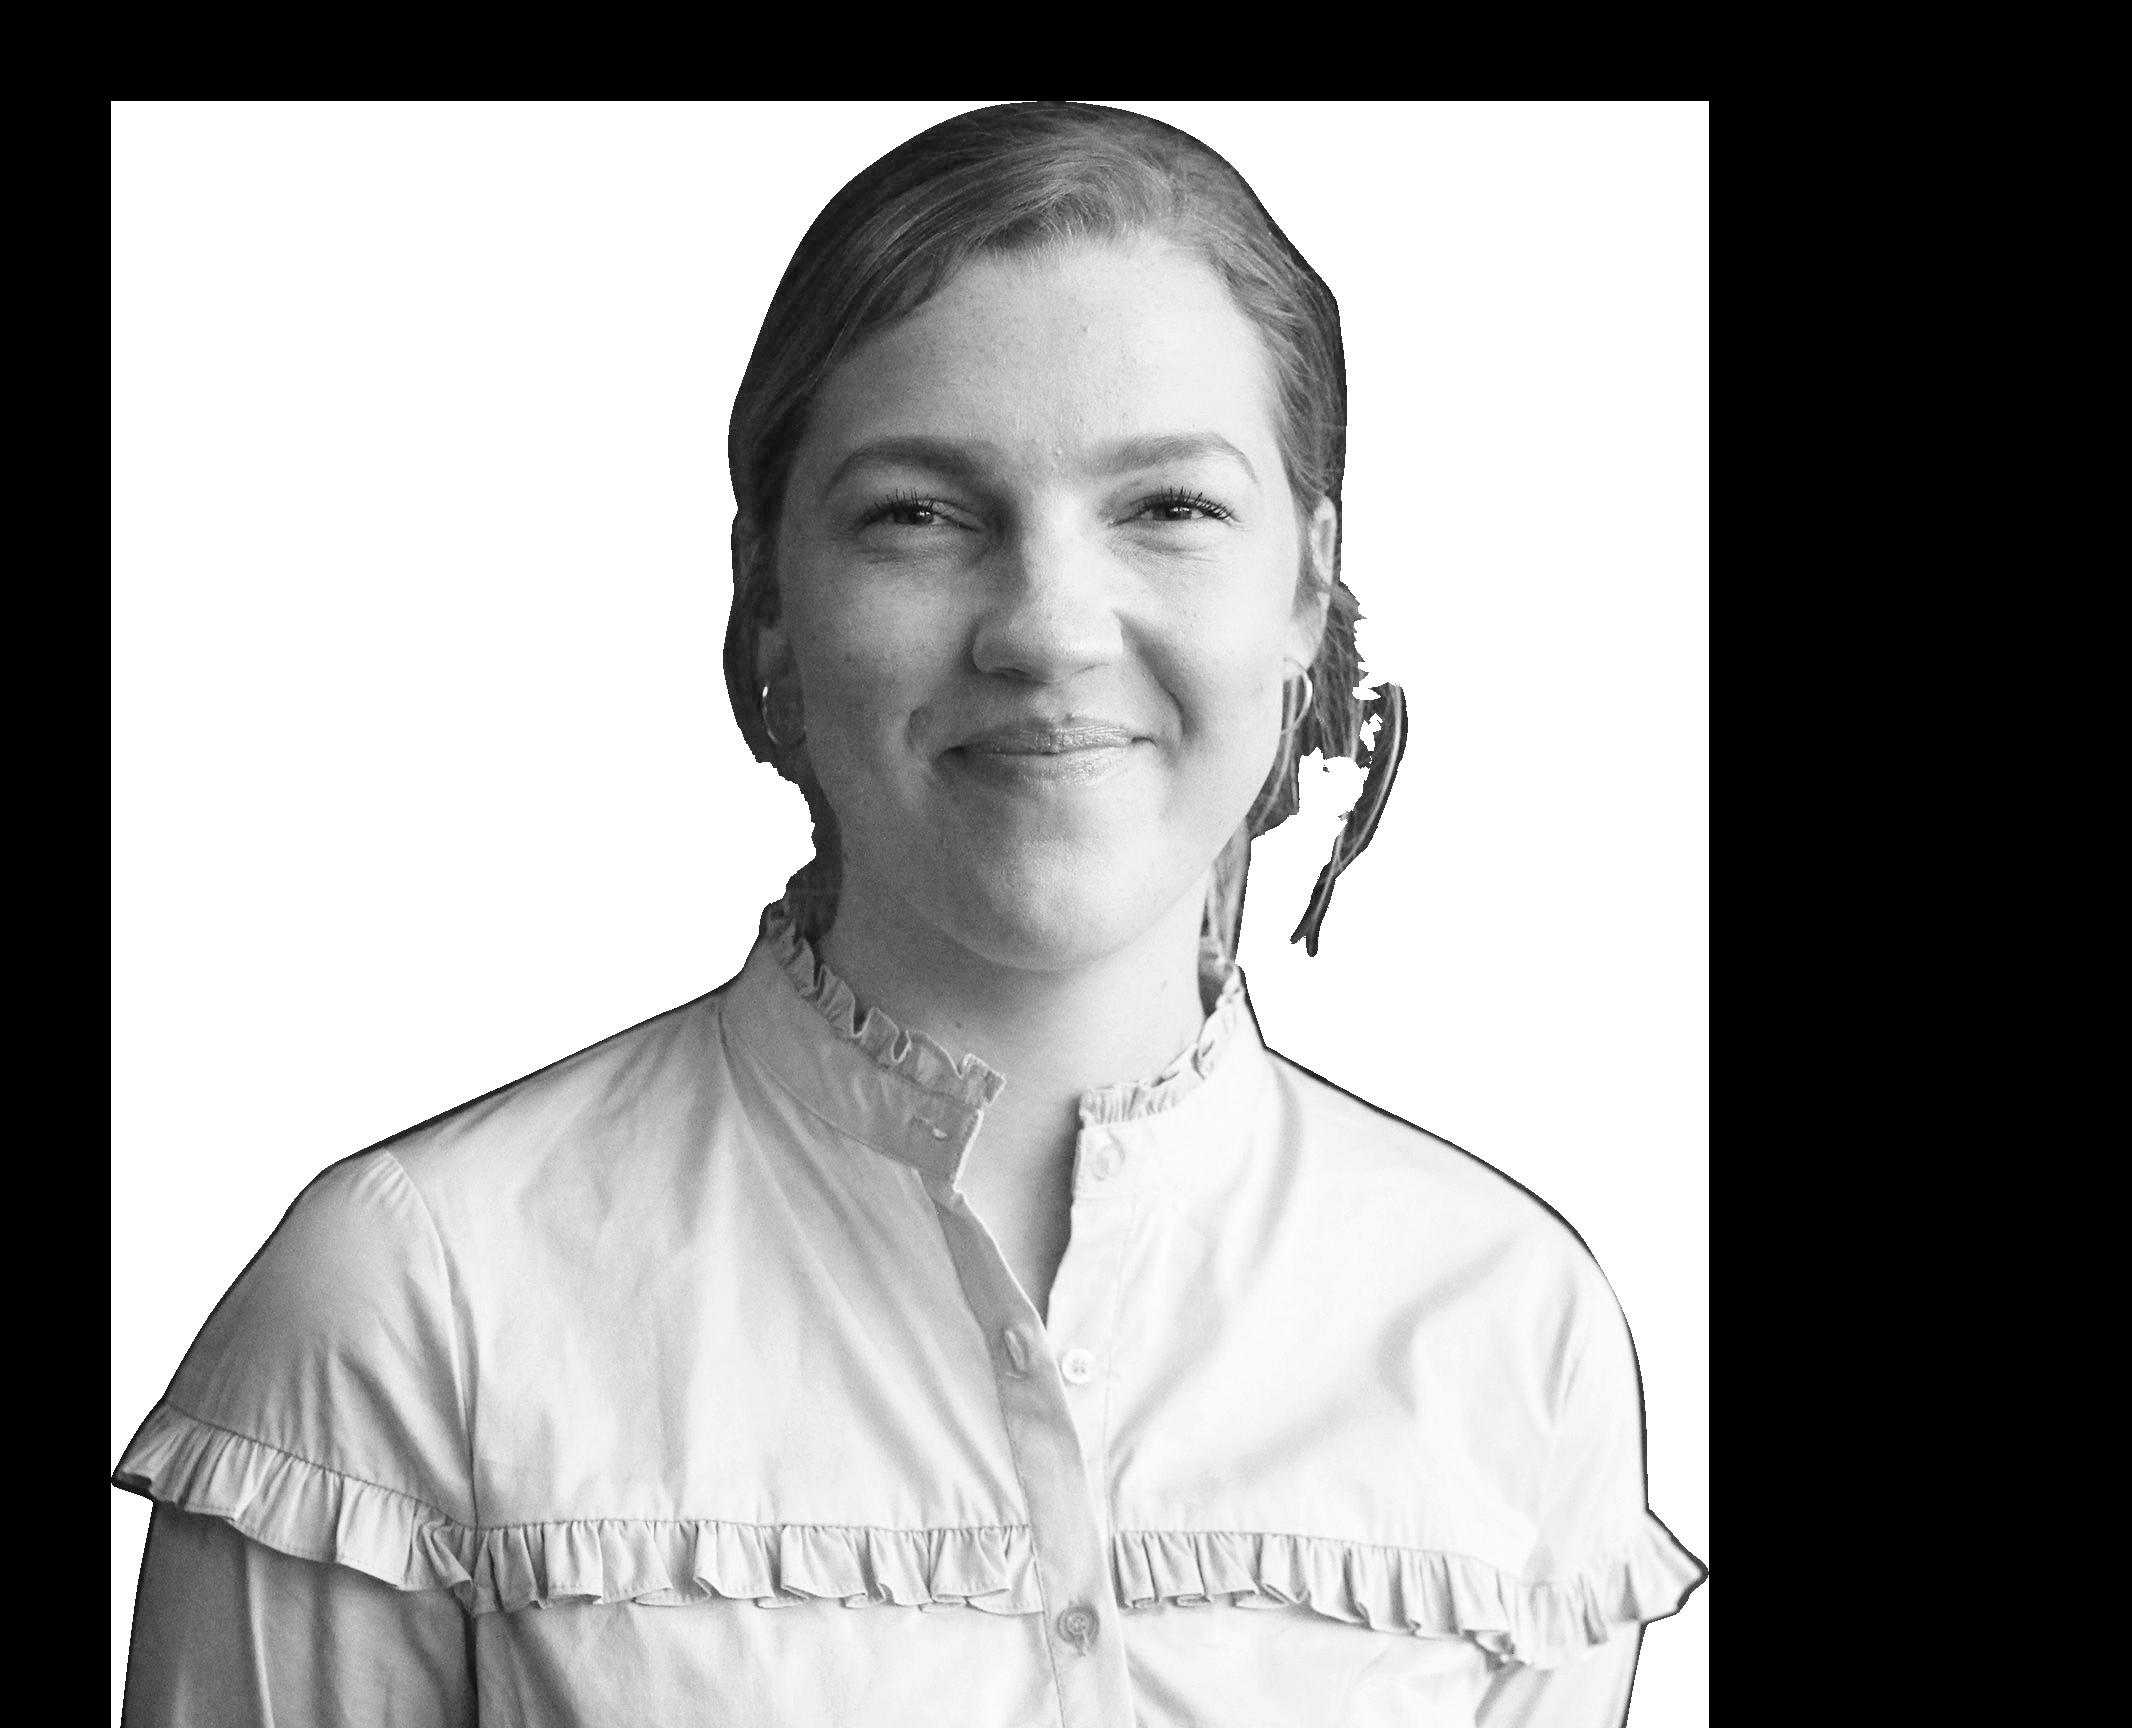 Hannah-Dalen Offshore koordinator